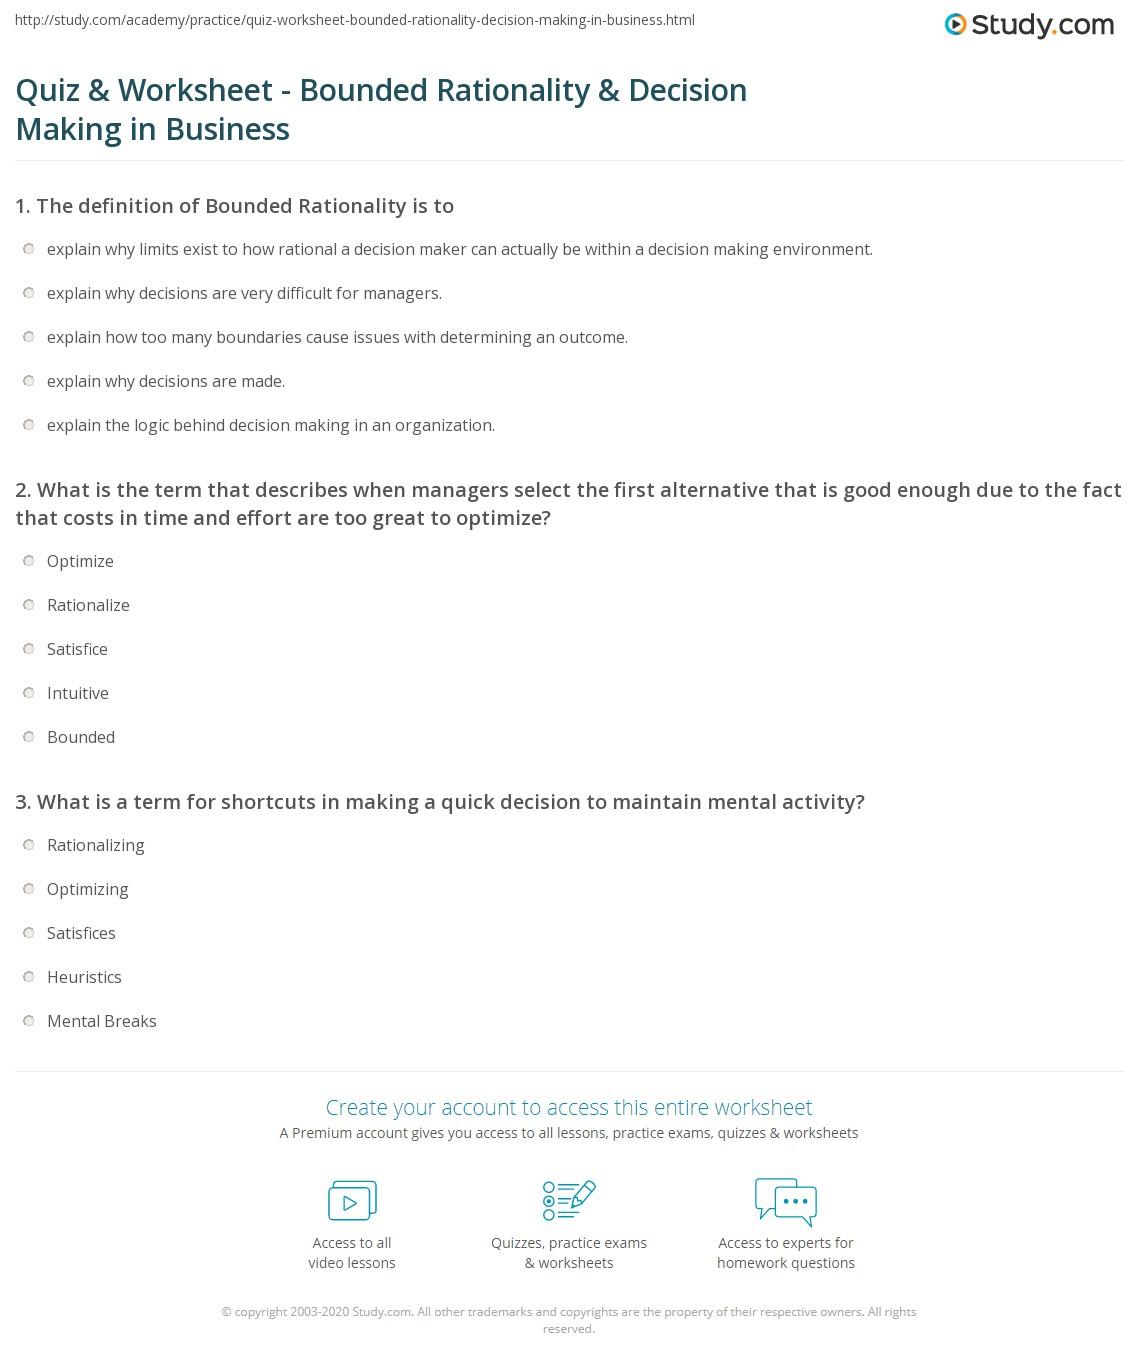 Free Worksheet Decision Making Skills Worksheets quiz worksheet bounded rationality decision making in print and organizations worksheet